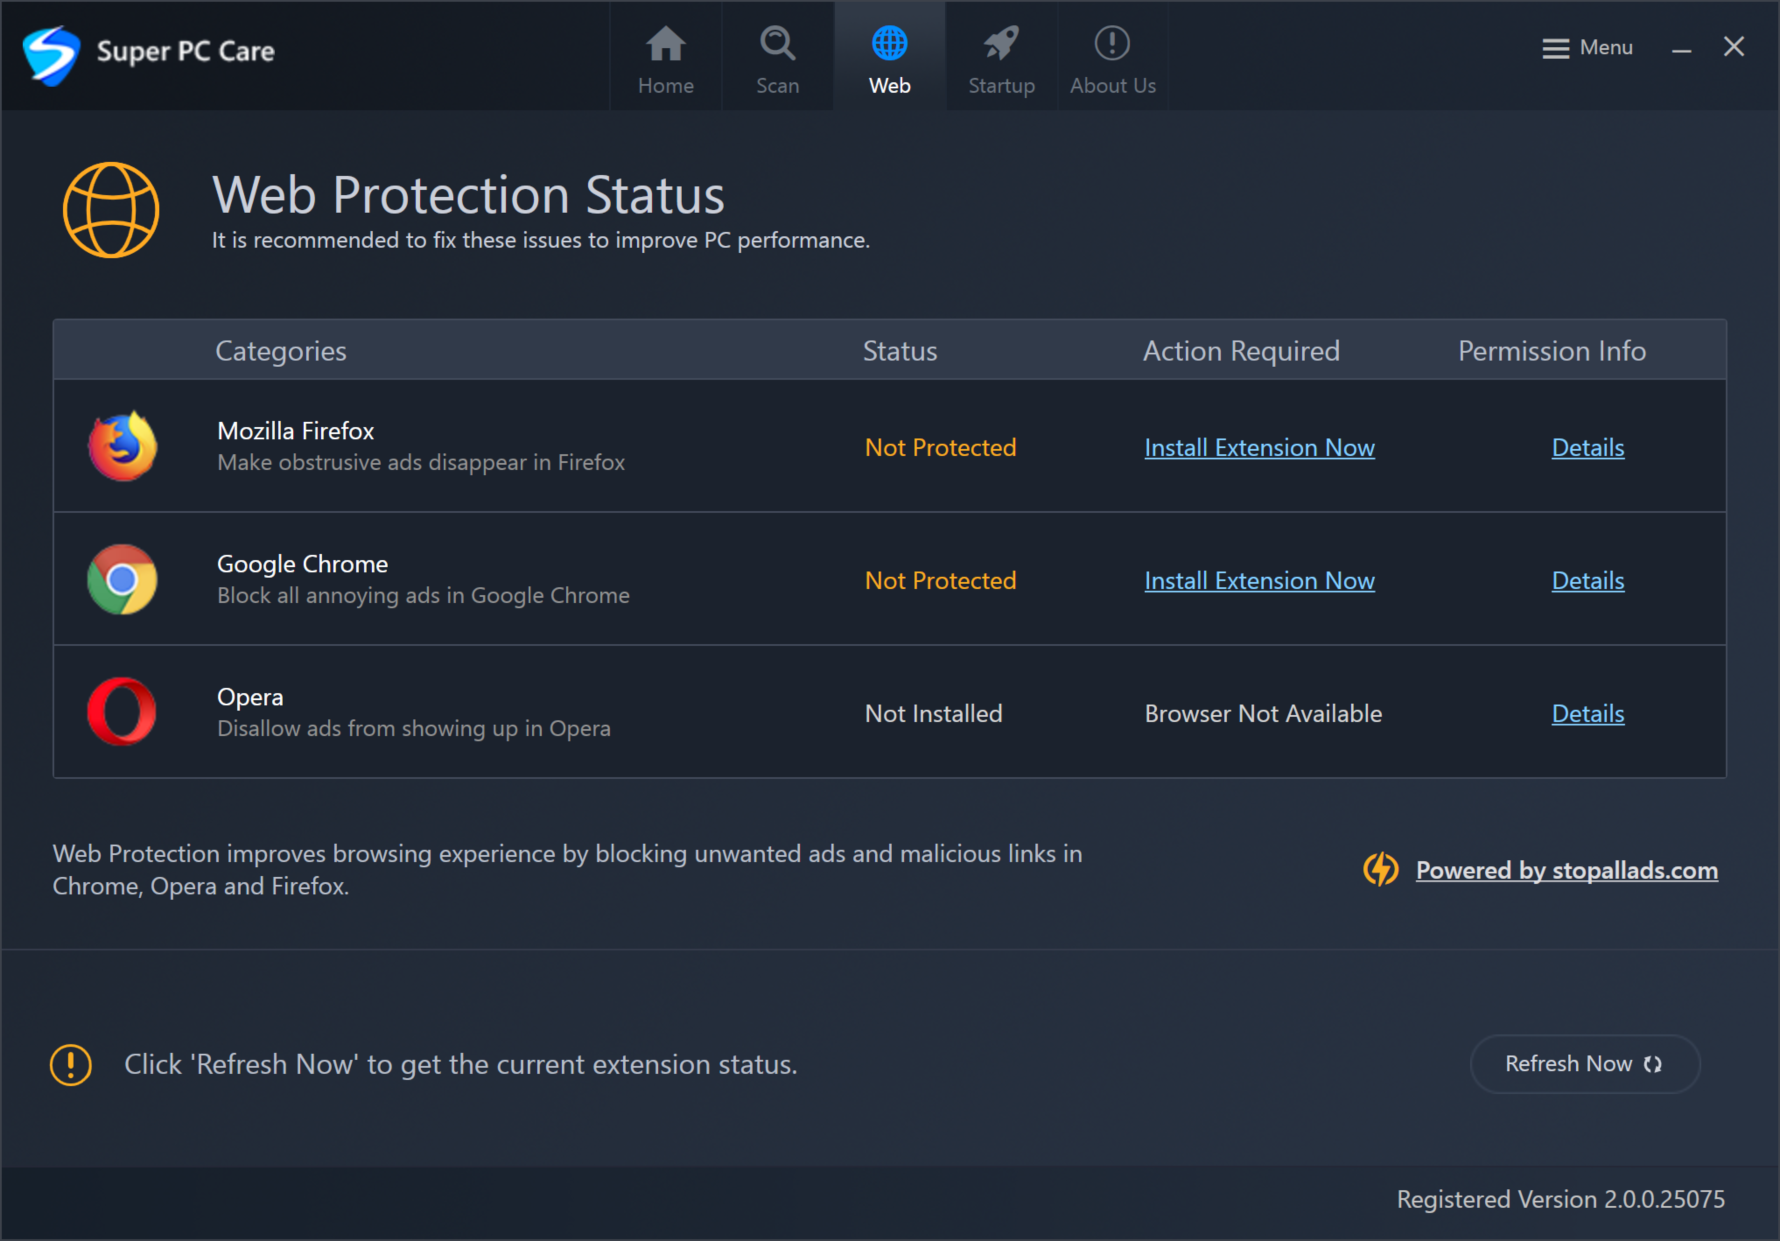 Super PC Care- Web Protection Status